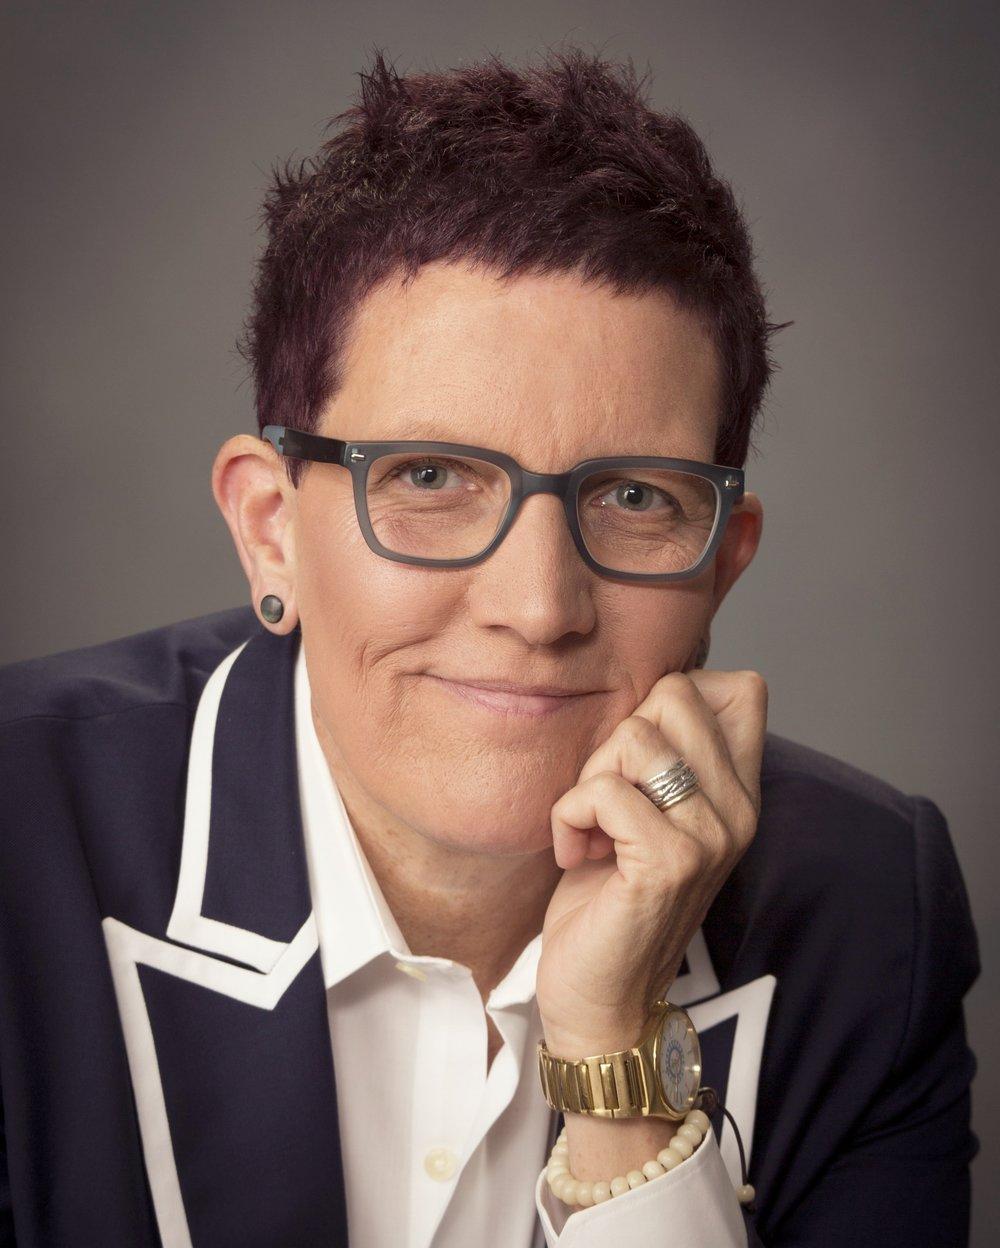 Monica-the-Coach-Emotional-intelligence-coaching